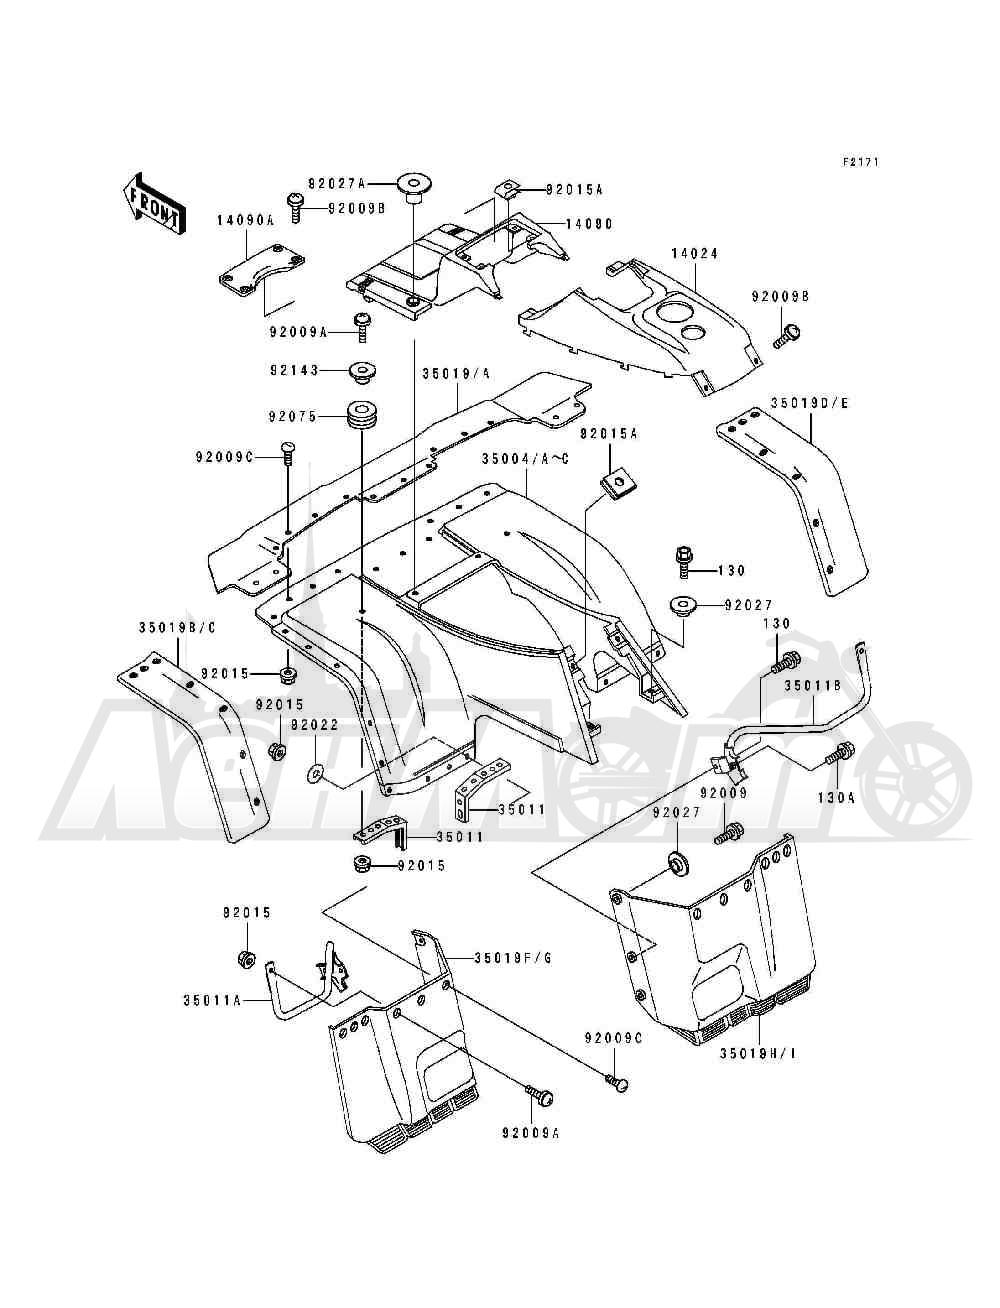 Запчасти для Квадроцикла Kawasaki 1994 BAYOU 400 4X4 (KLF400-B2) Раздел: FRONT FENDER(S)   переднее крыло (S)